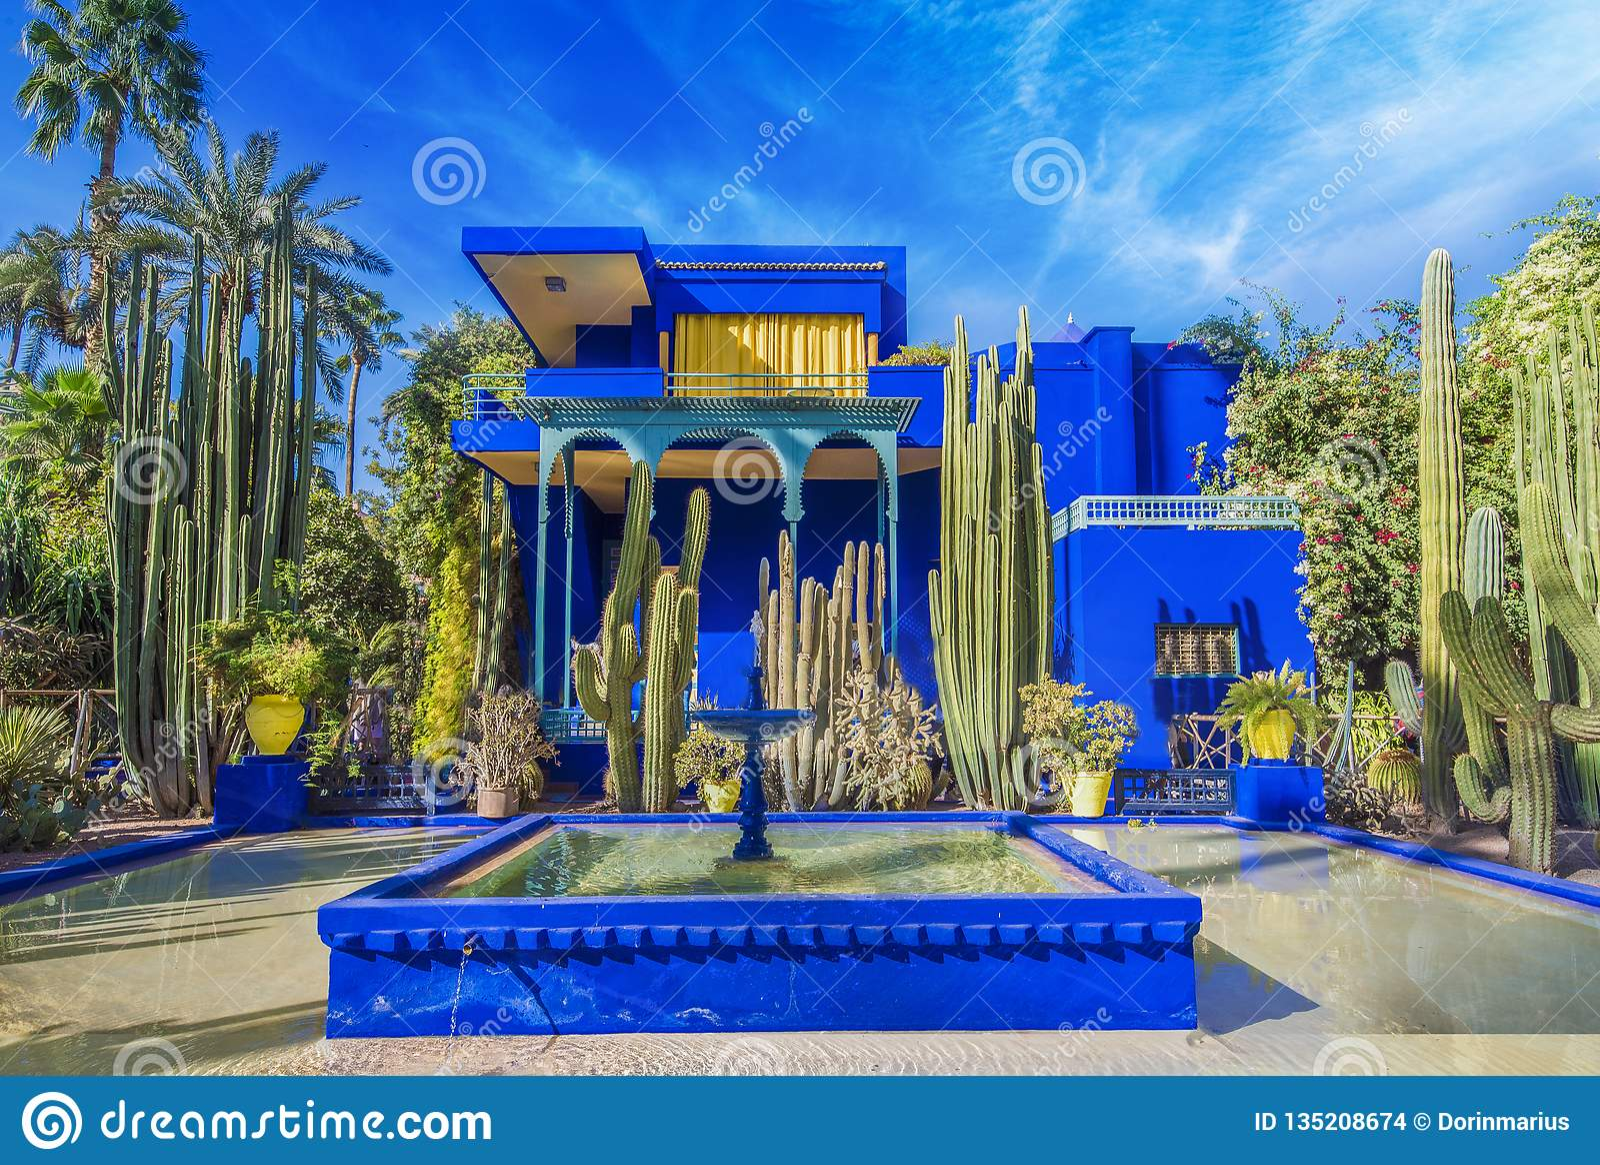 Le Jardin Majorelle Amazing Tropical Garden In Marrakech Stock